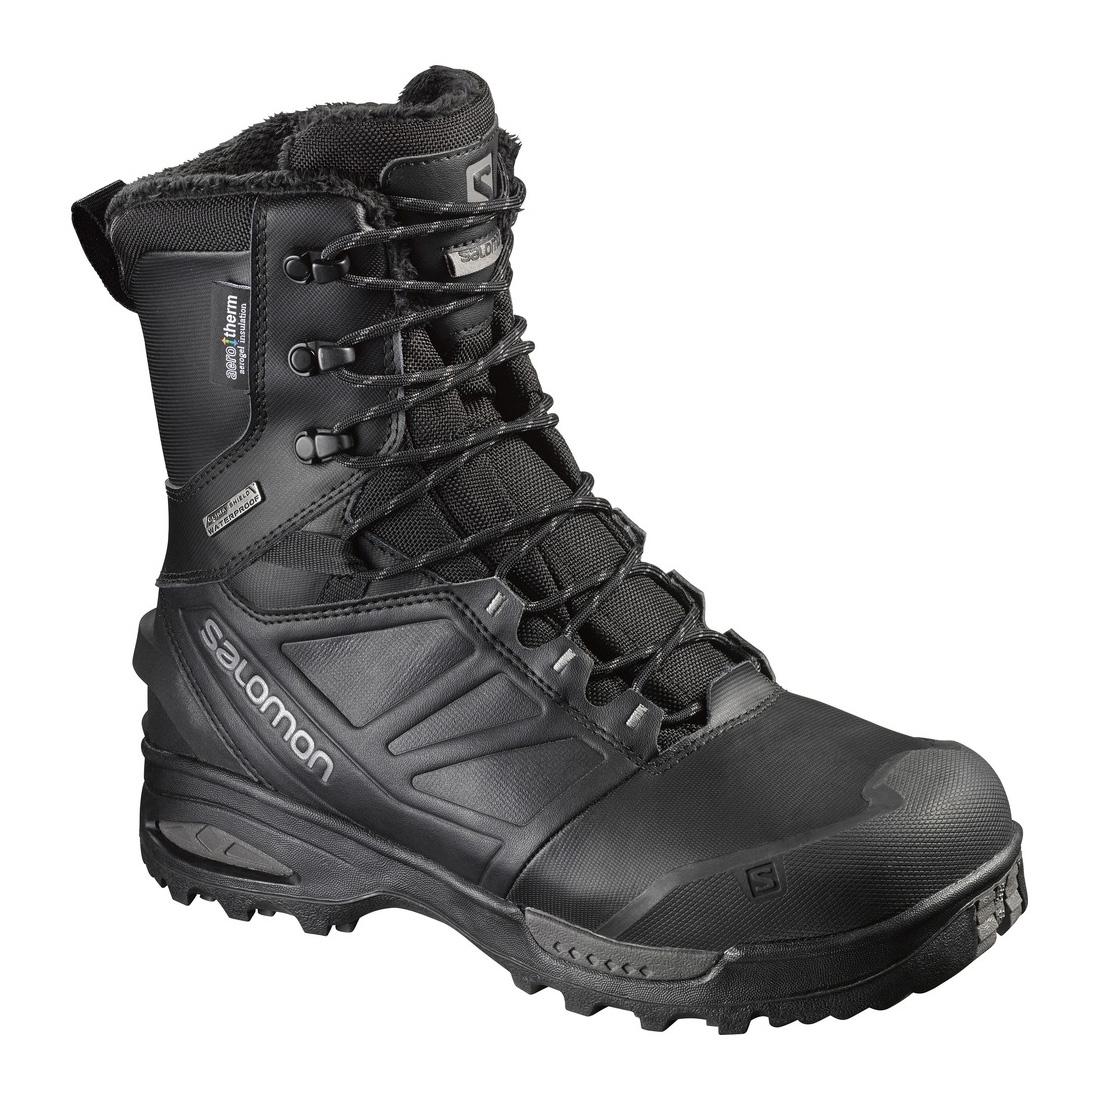 salomon toundra pro cswp walking boots s black